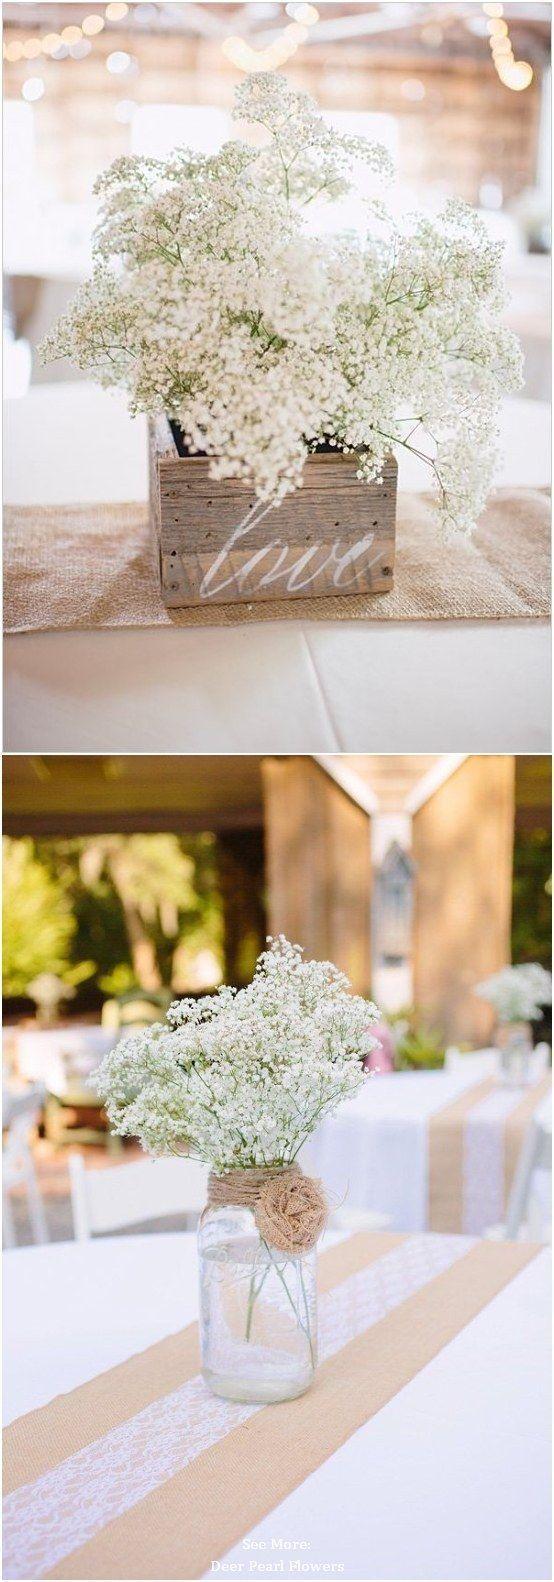 68 Baby's Breath Wedding Ideas for Rustic Weddings / www.deerpearlflow…